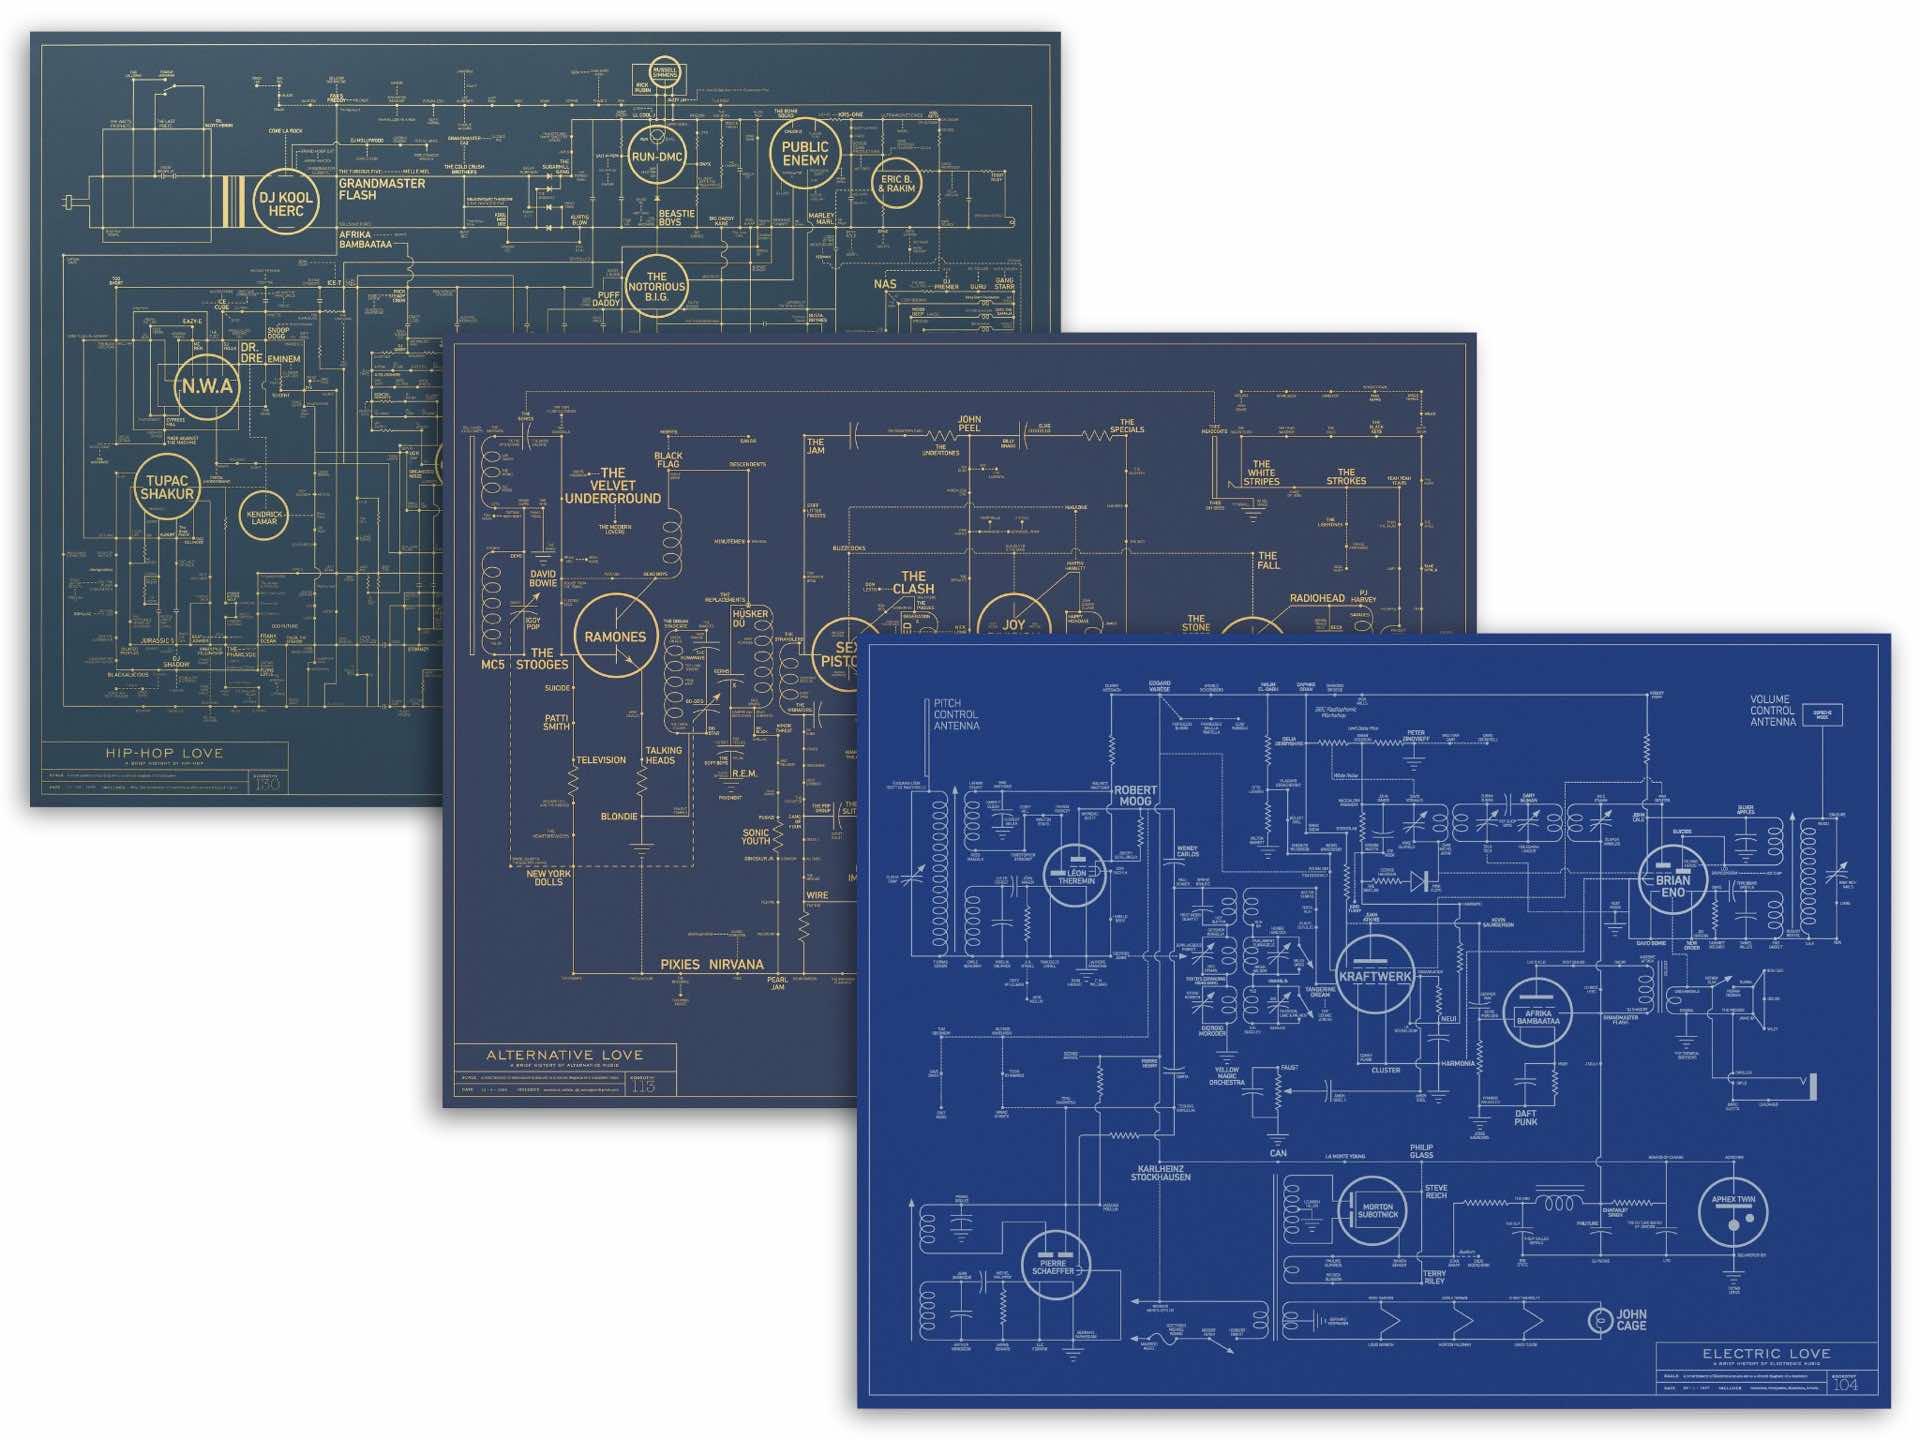 dorothy-music-history-blueprints